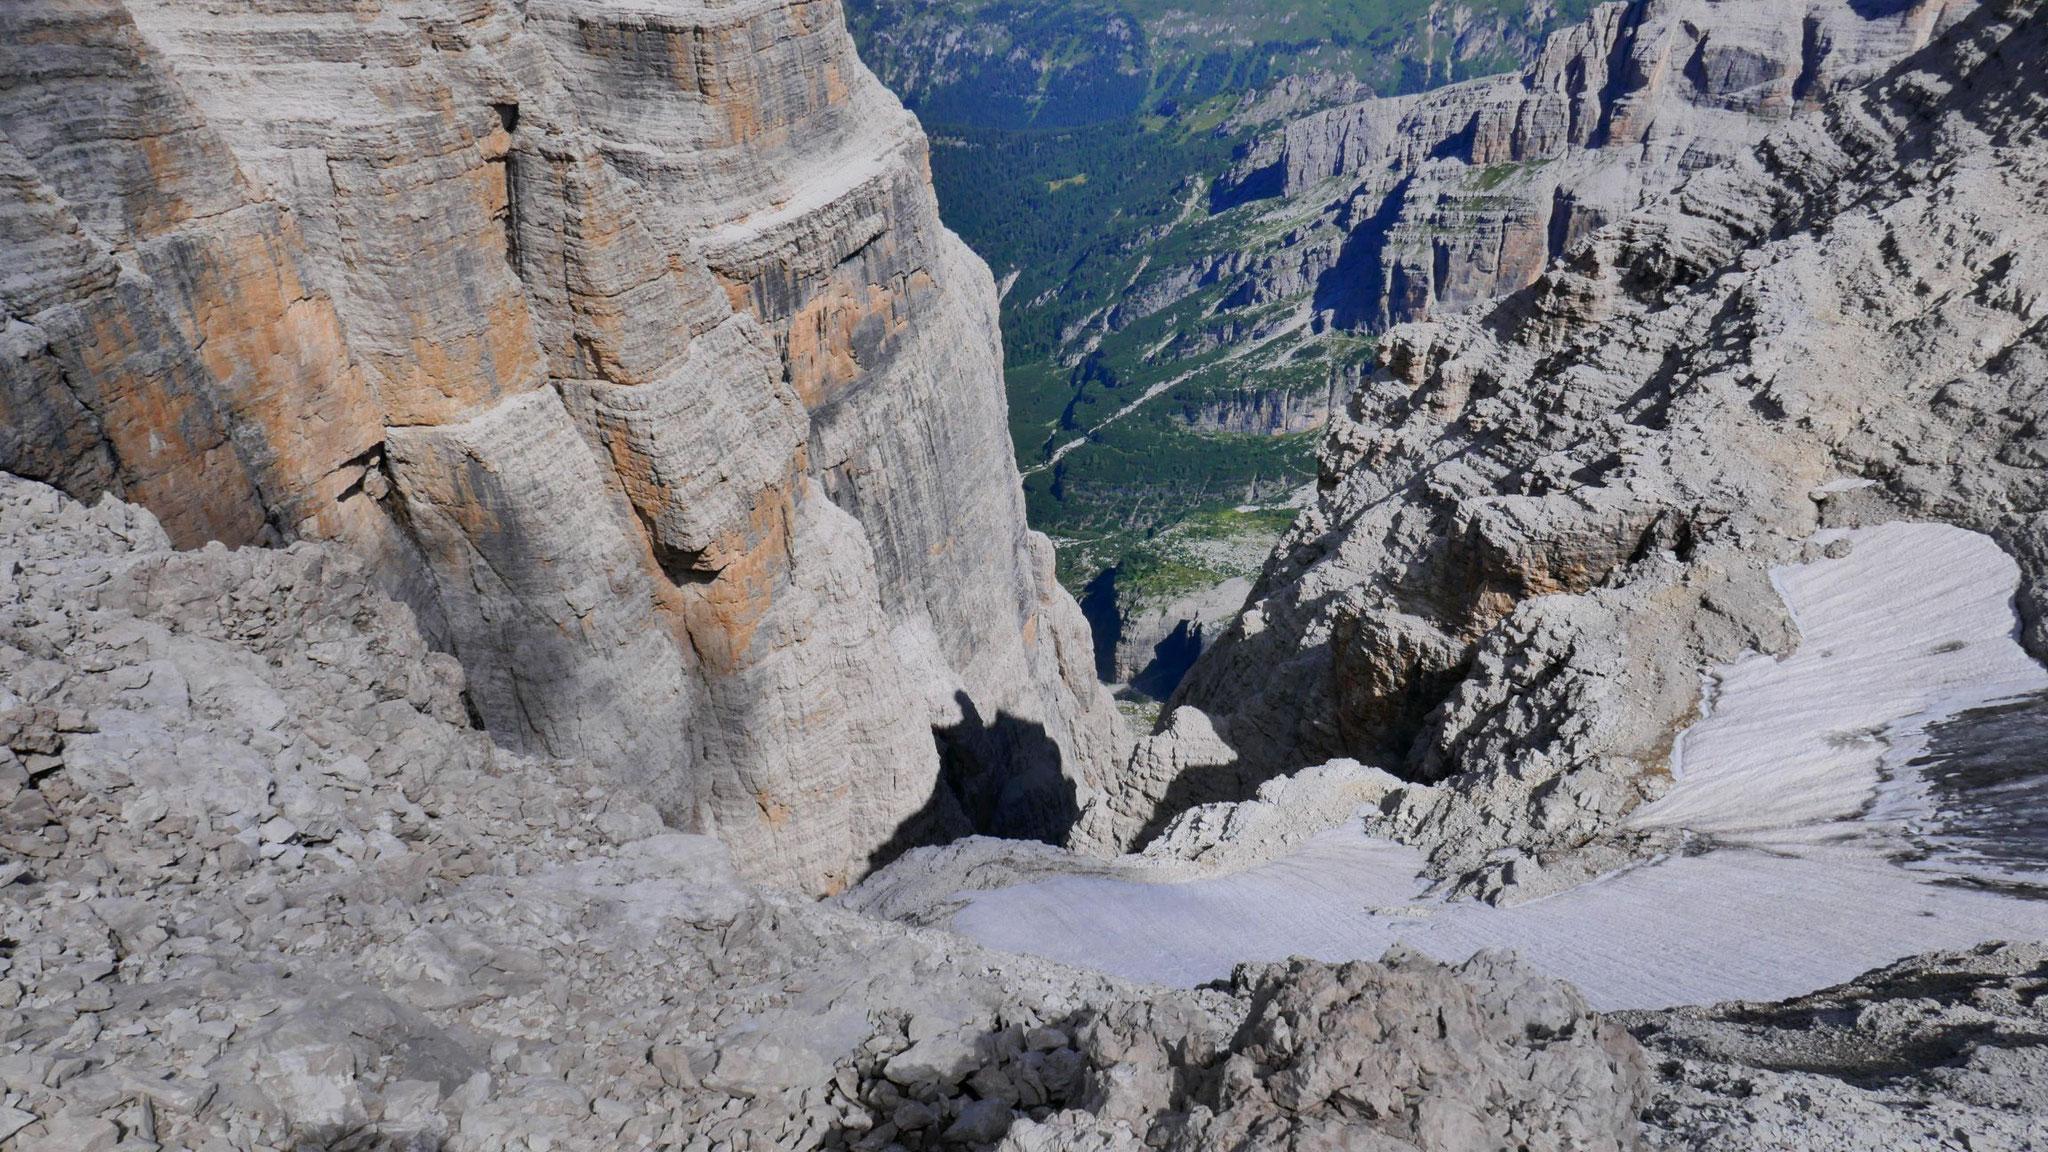 Nordseitiger Gletscher an der Cima Tosa